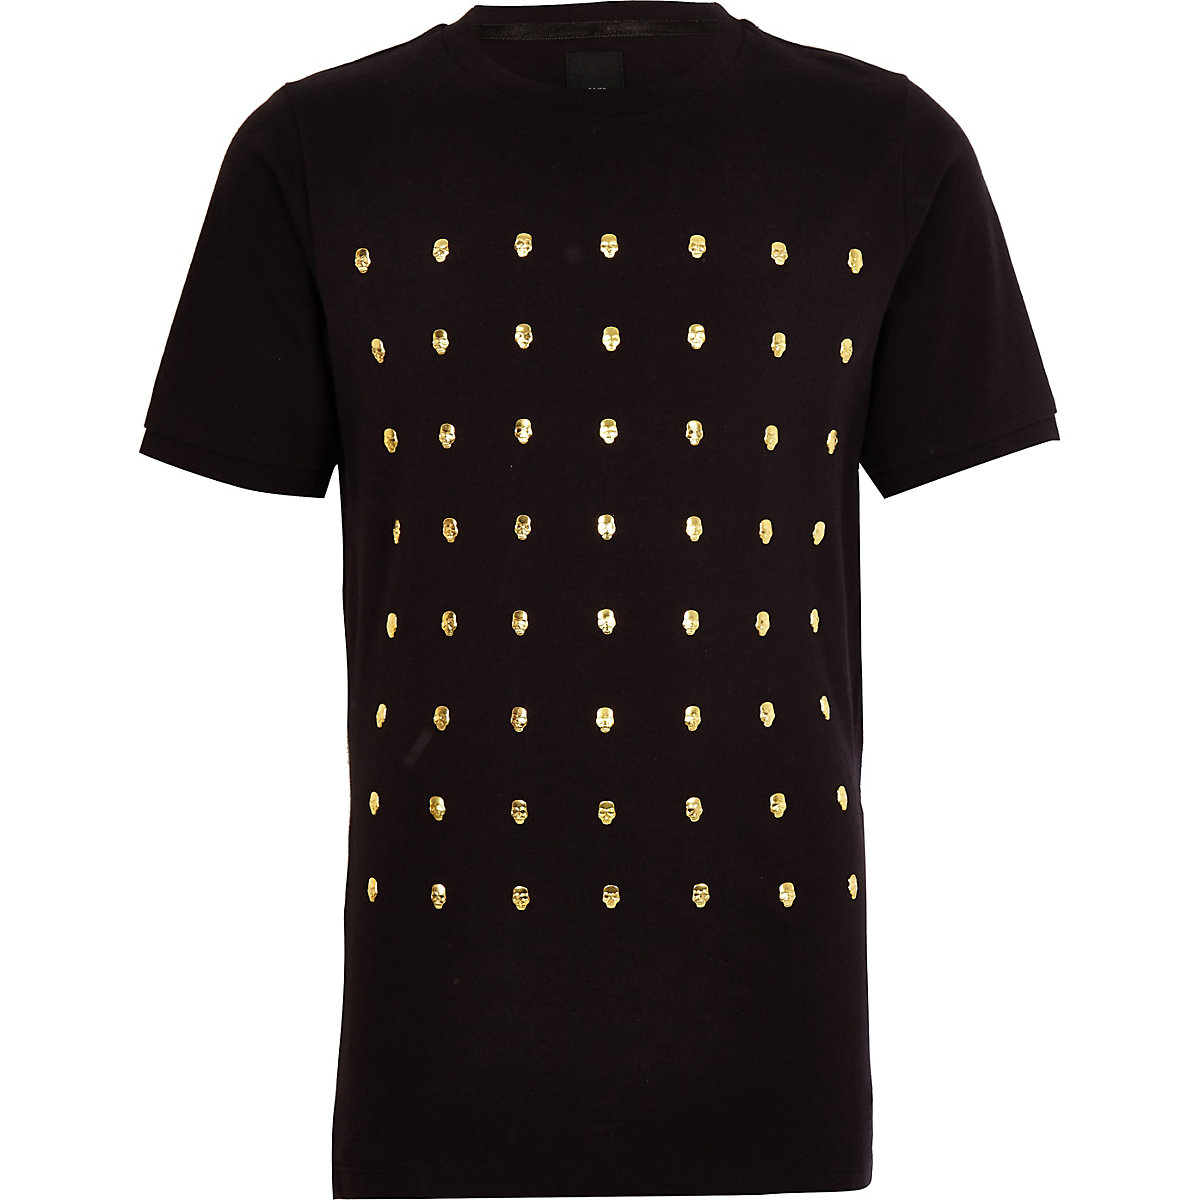 Schwarzes T-Shirt mit Nieten